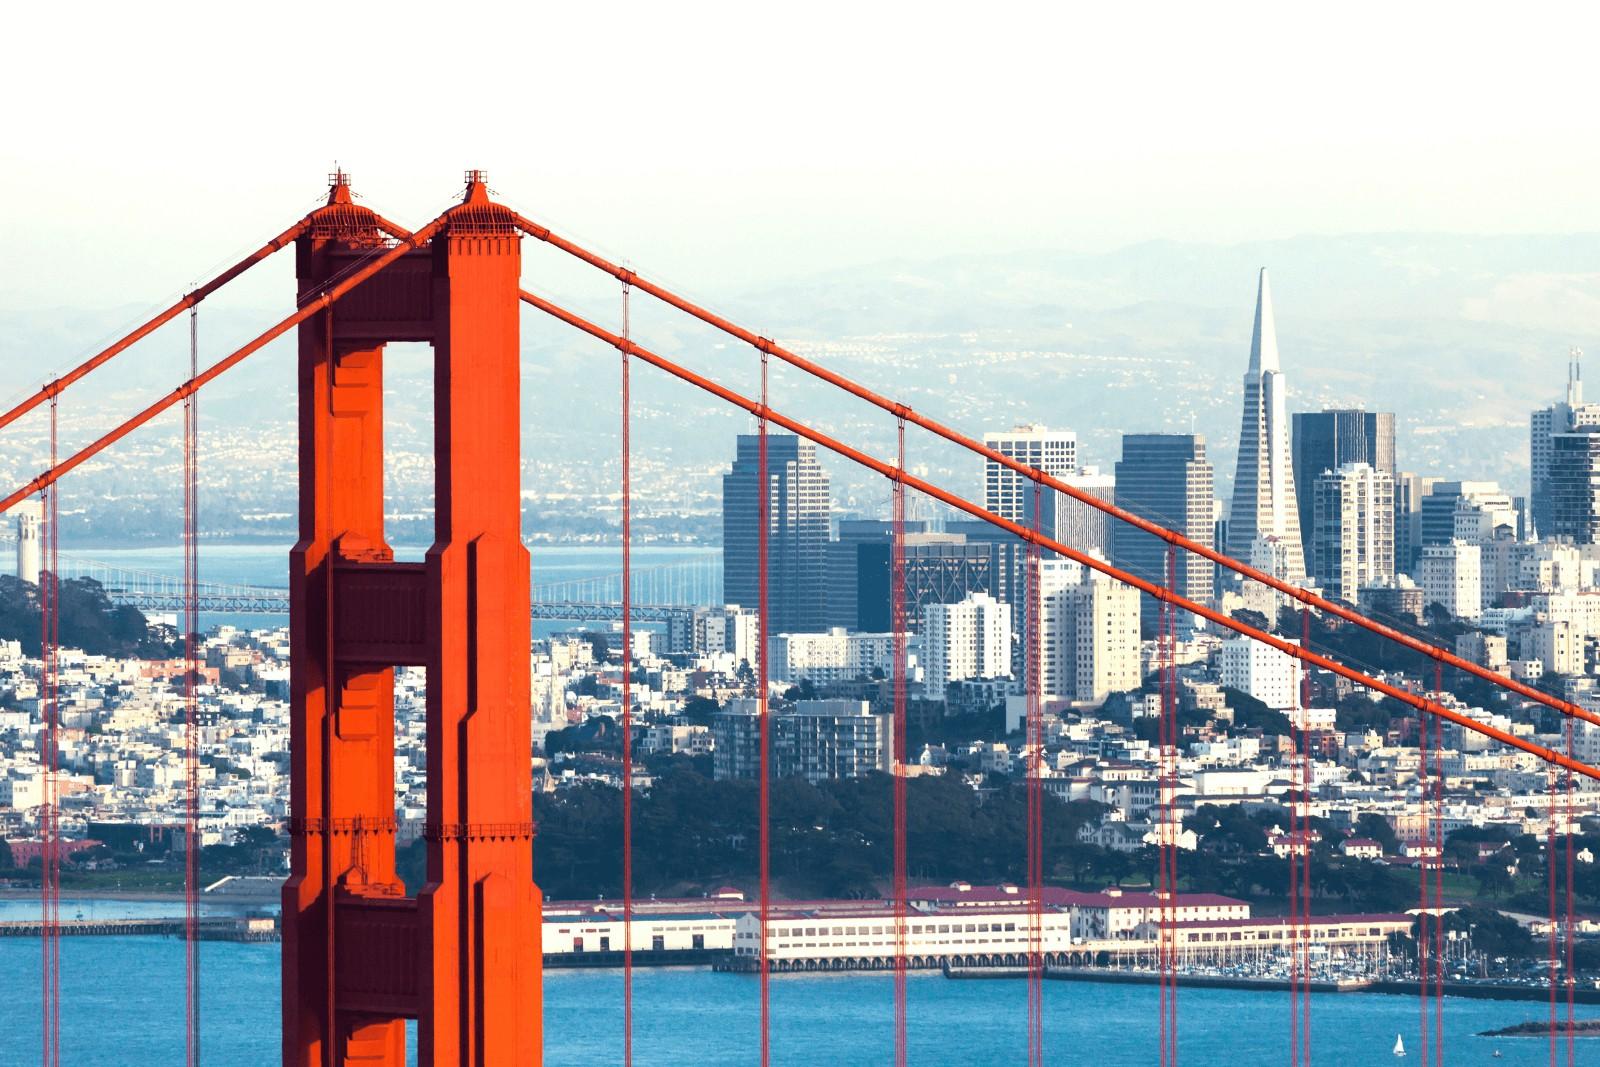 golden gate bridge with an overlook of the cities